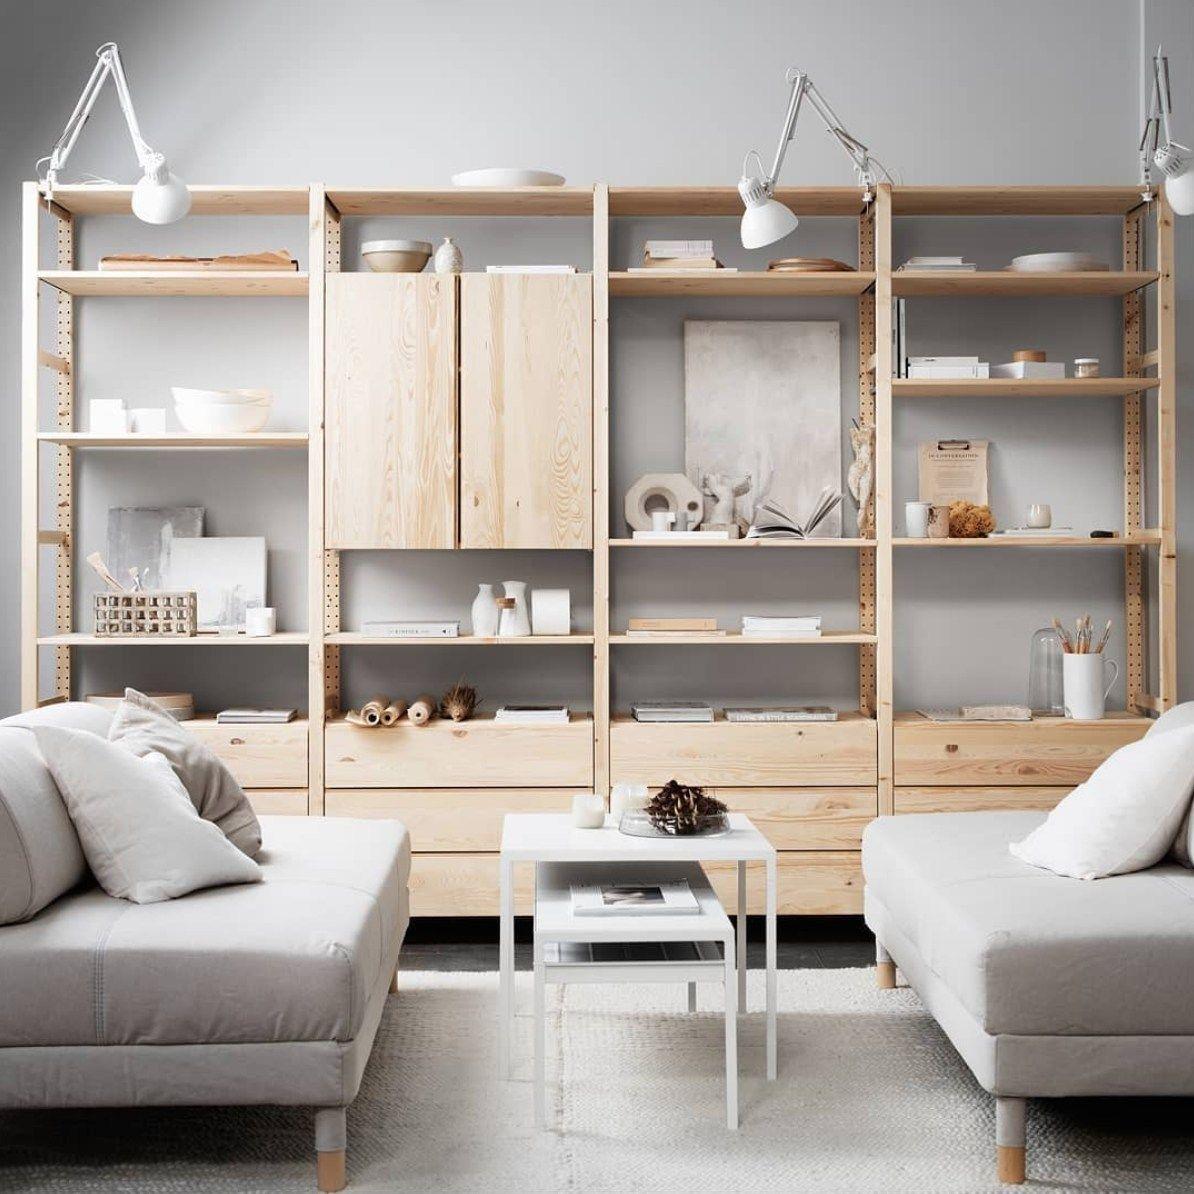 ikea furniture ideas for living room decor05  decoraiso